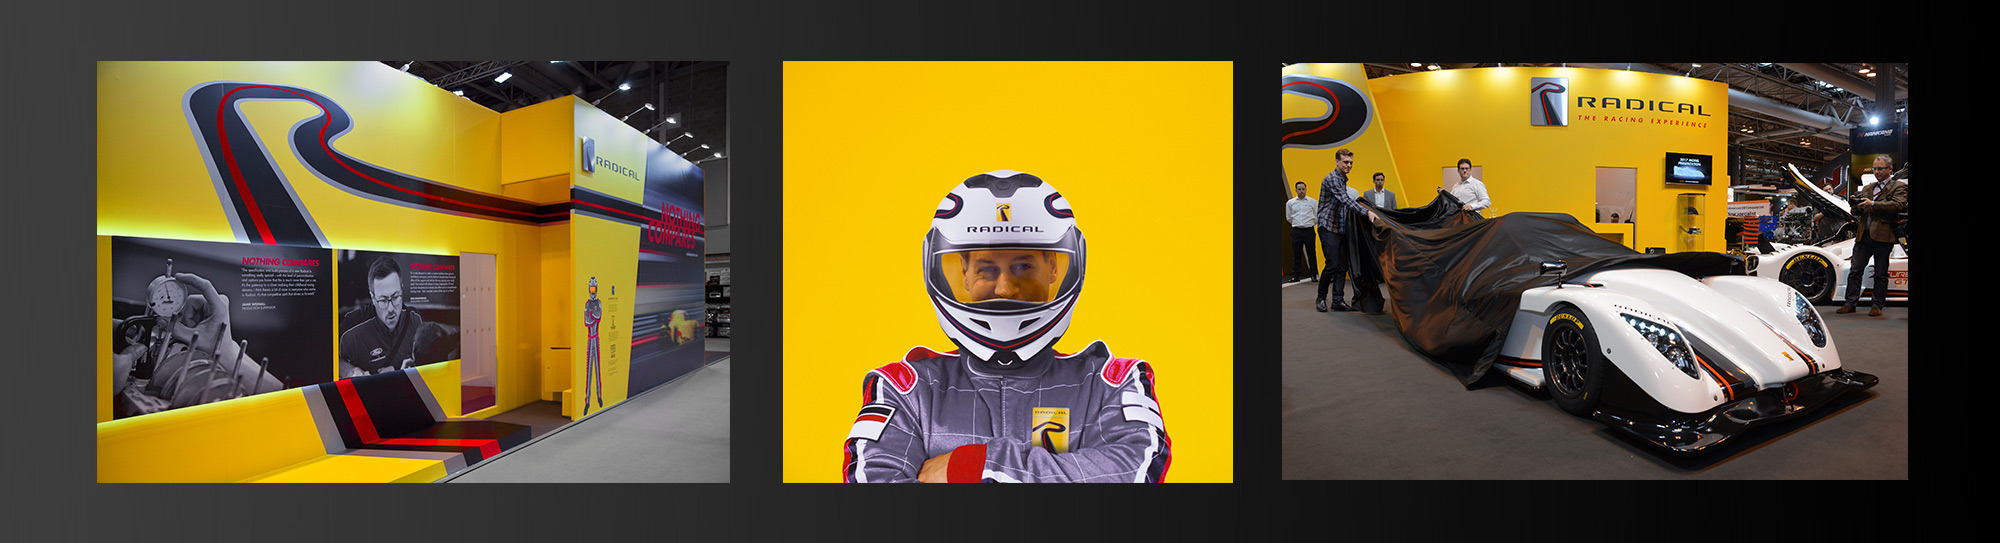 The-Allotment-Radical-Autosport-3